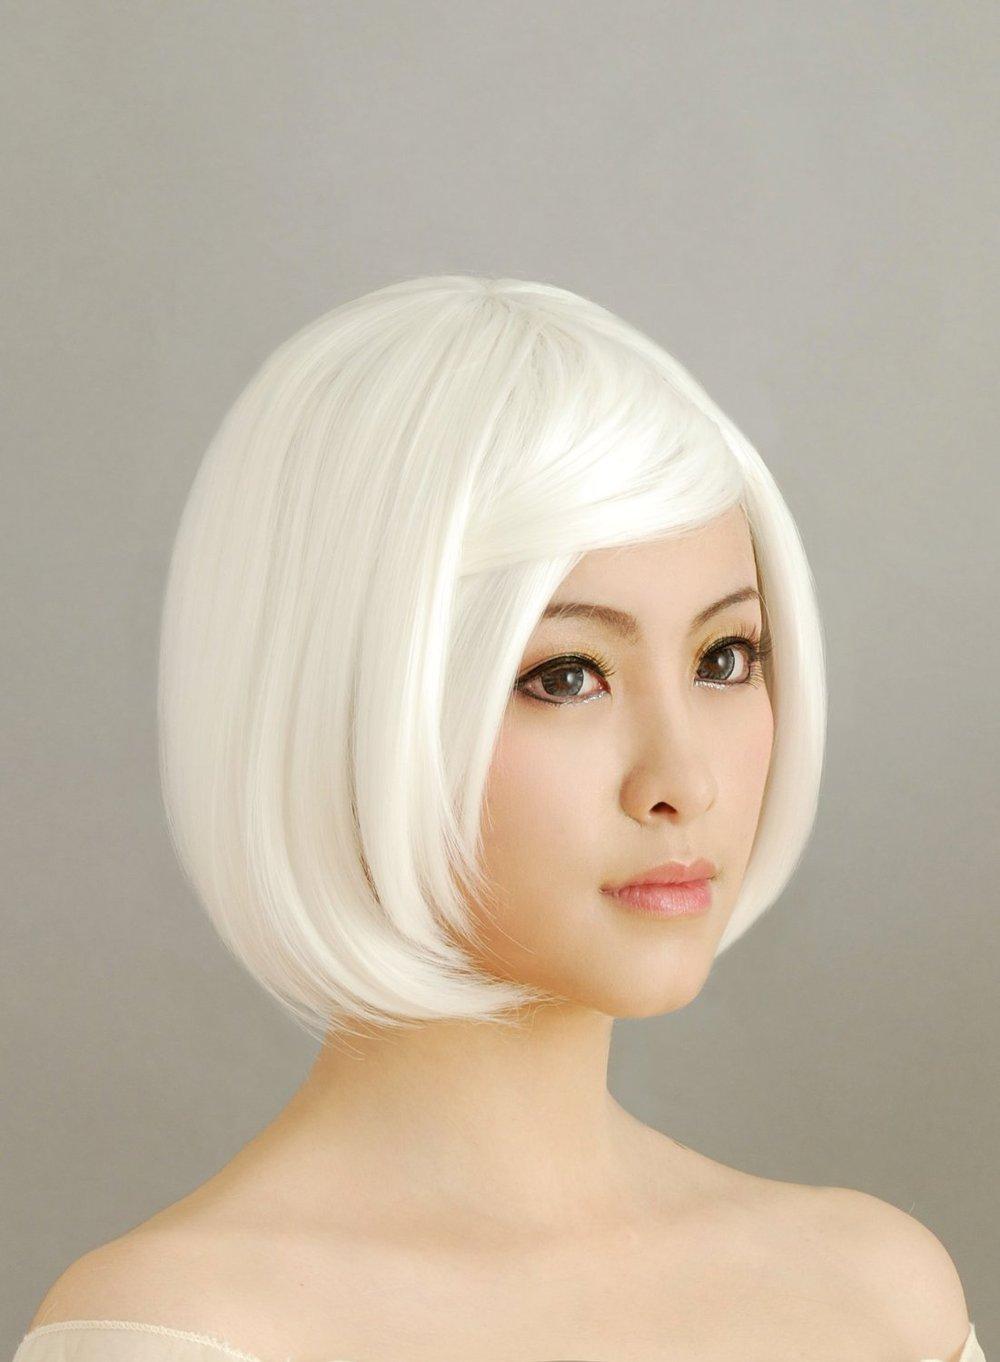 Buy White Wigs Online - Wigs By Unique 5c7c79f51ad0